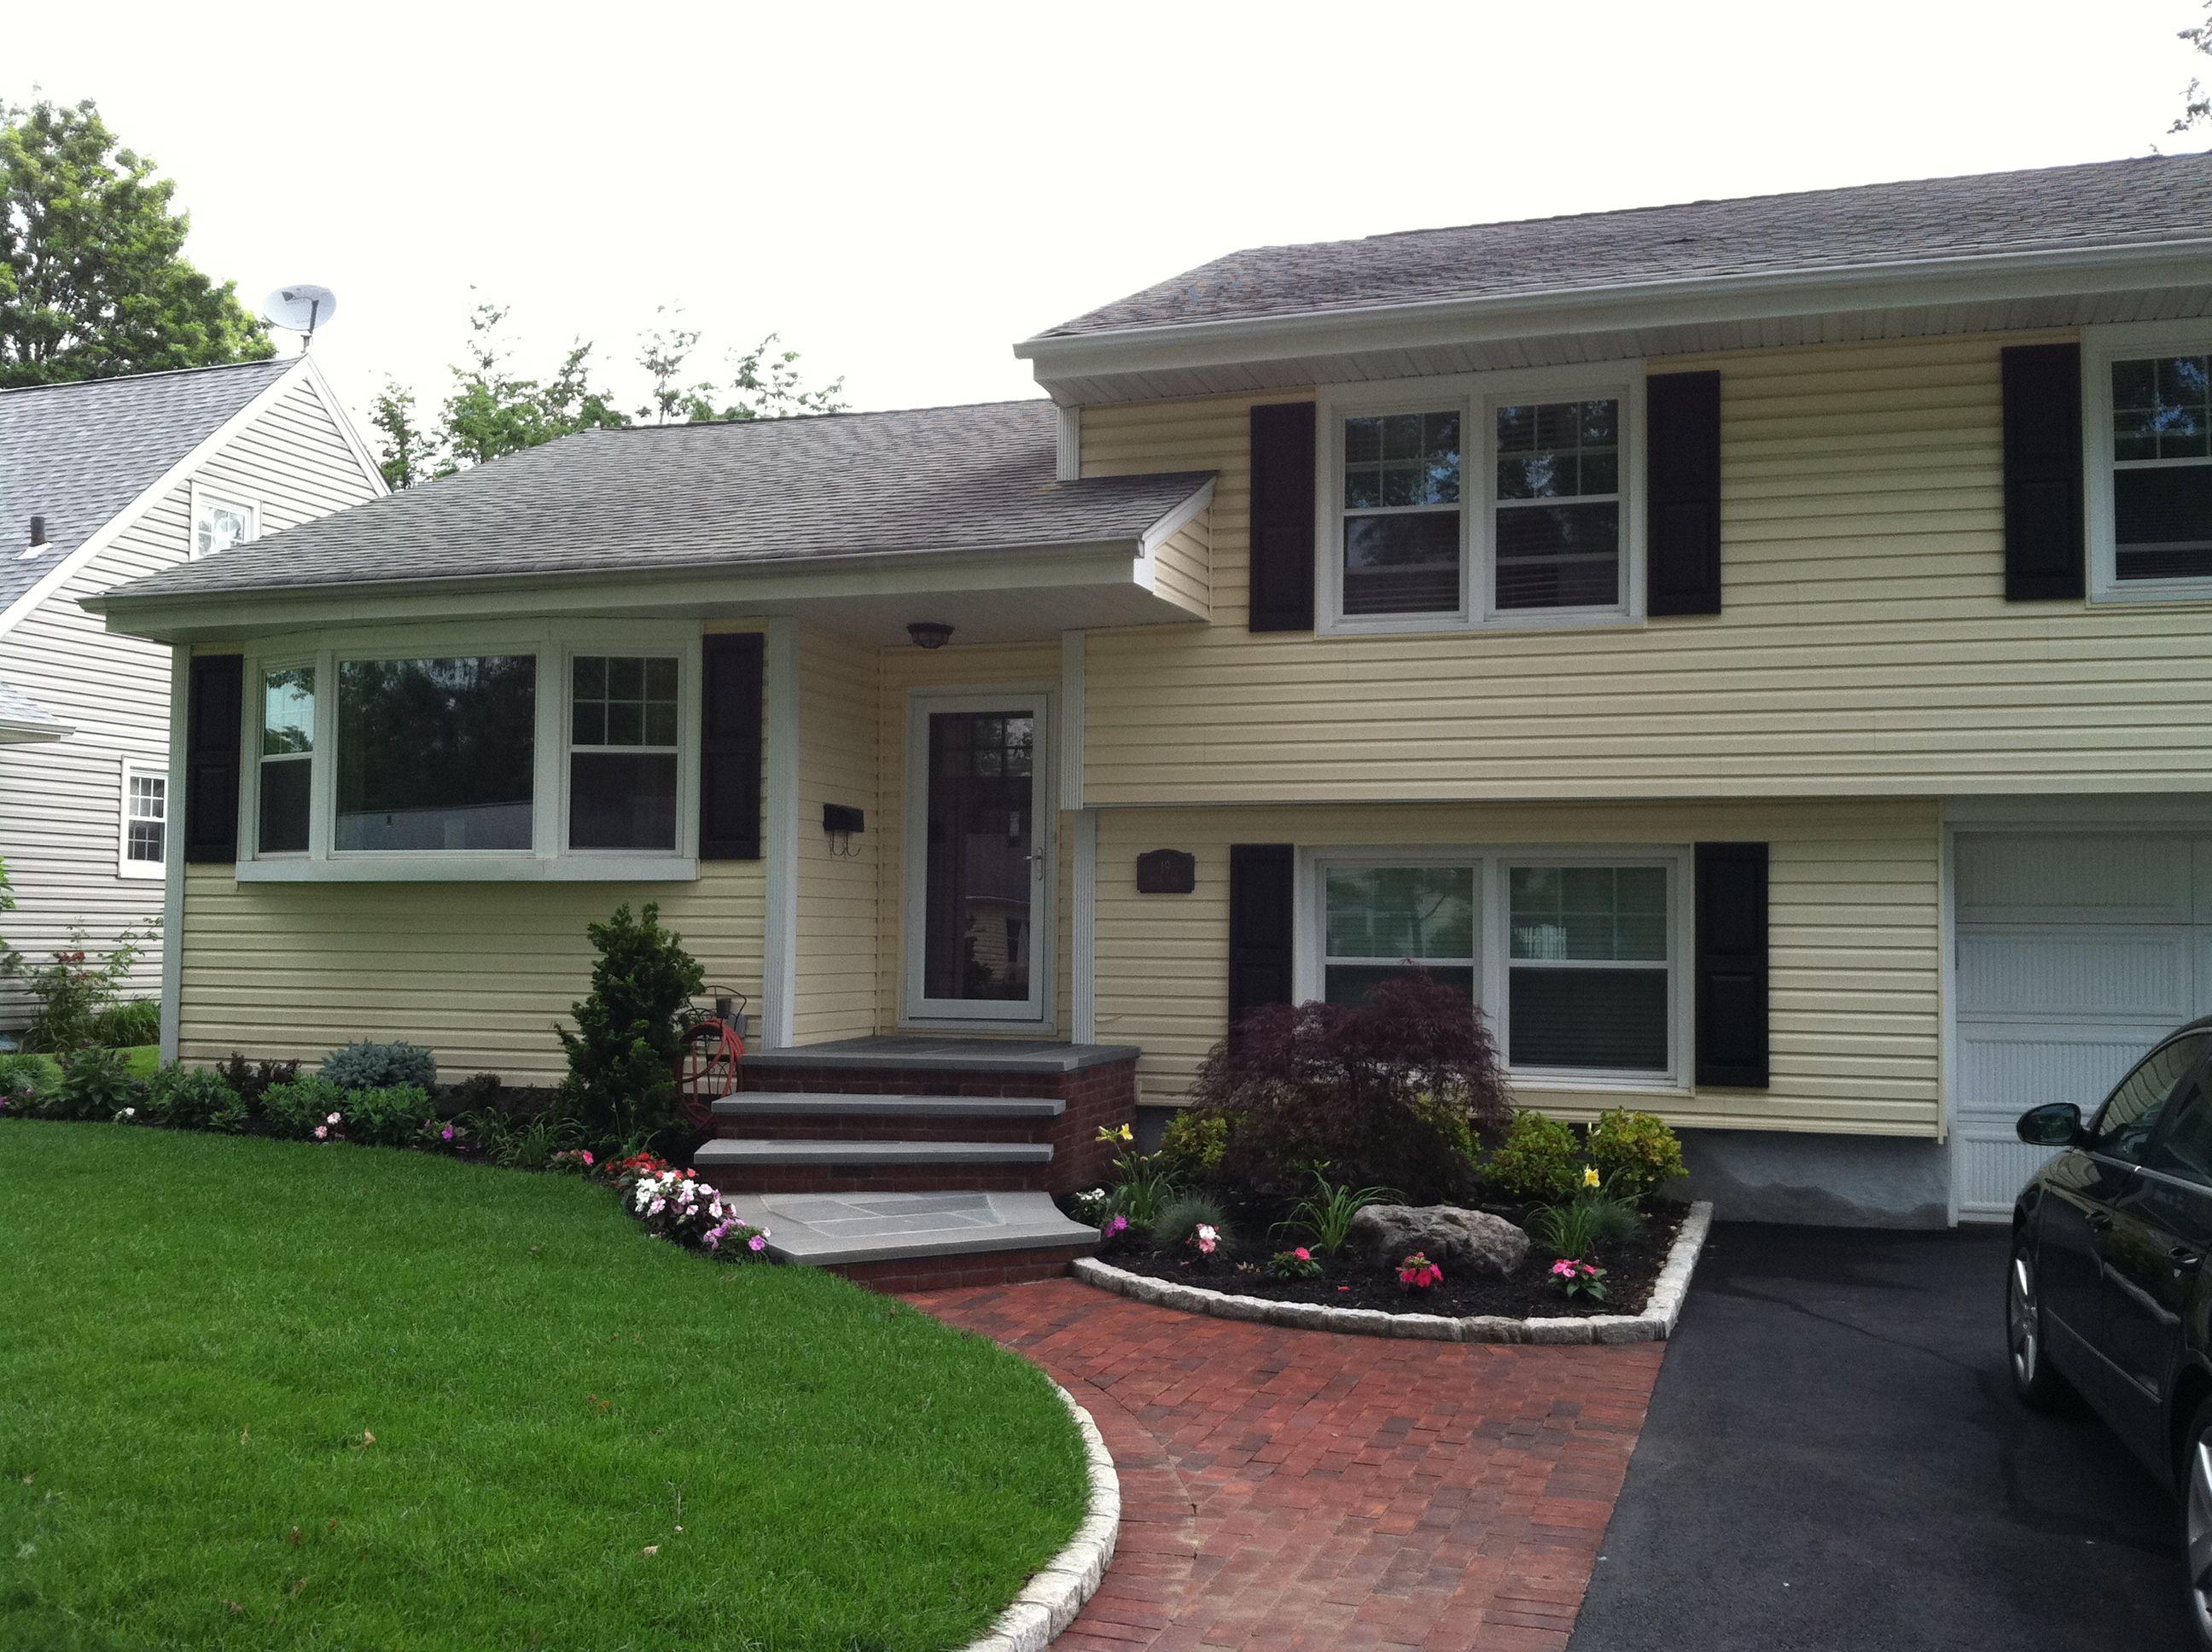 Img 0067 Jpg 2 592 1 936 Pixels House Exterior Tri Level House